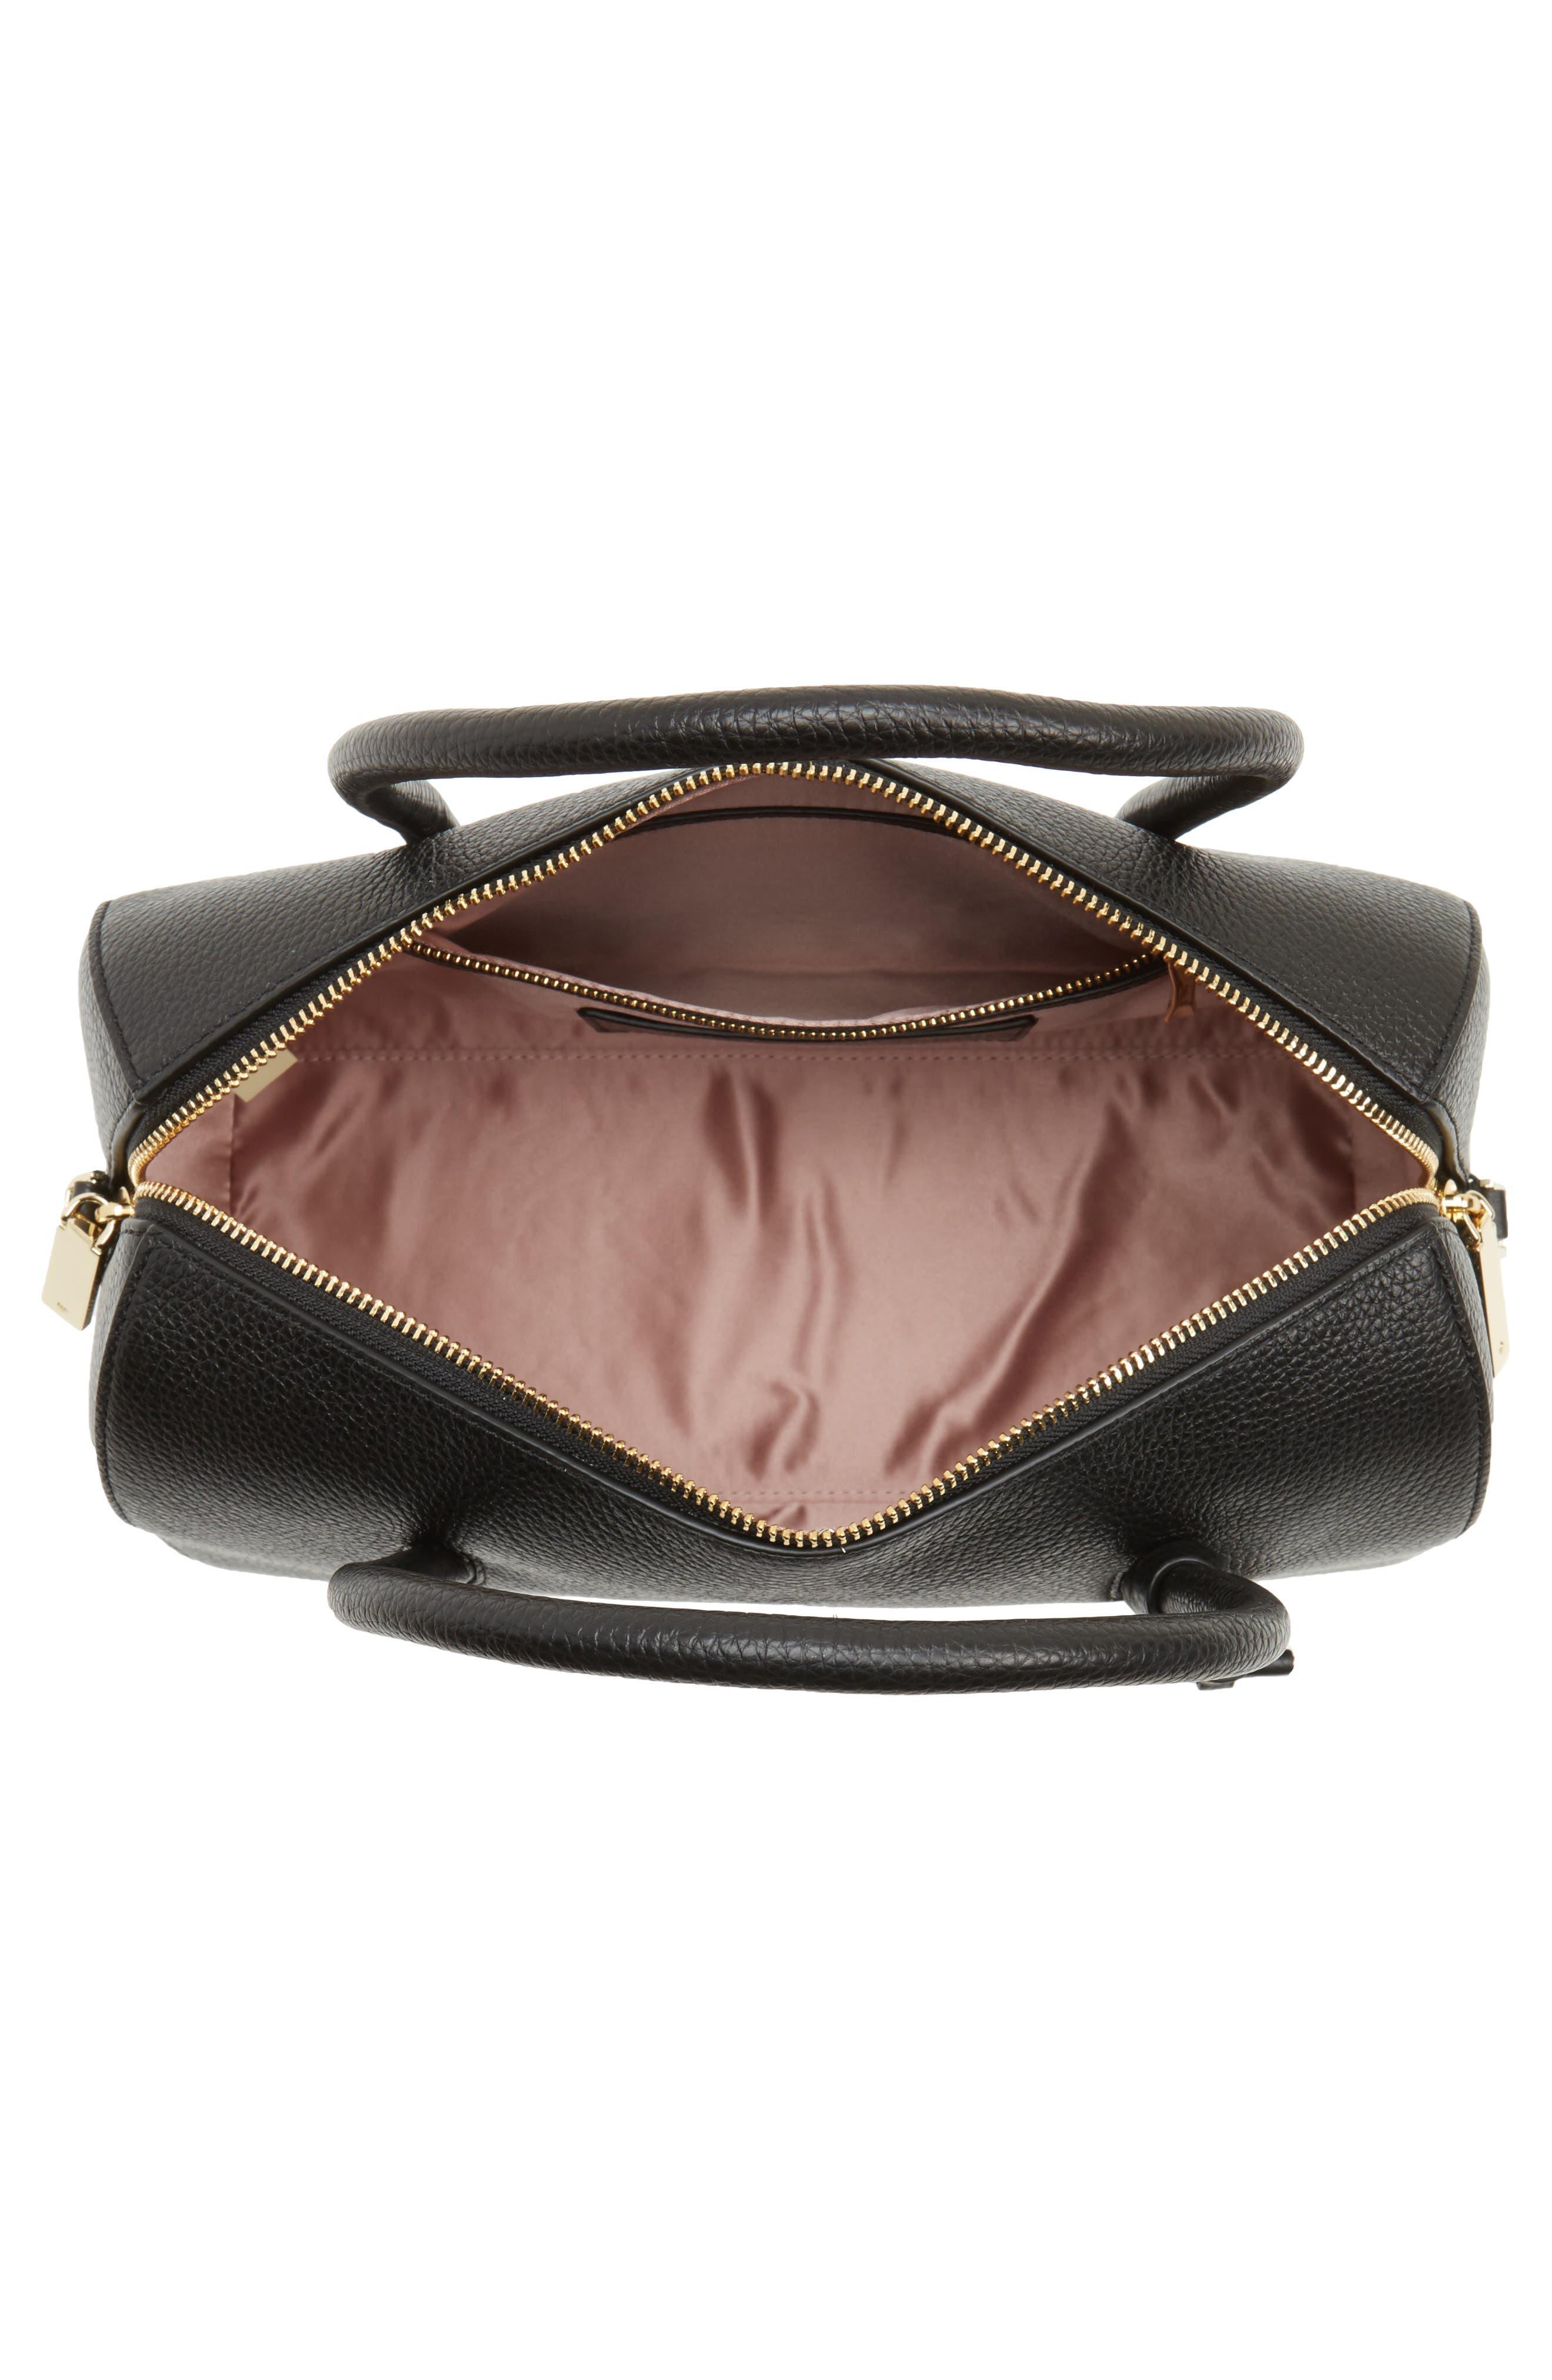 mega madison knollwood drive - lane leather satchel,                             Alternate thumbnail 4, color,                             001